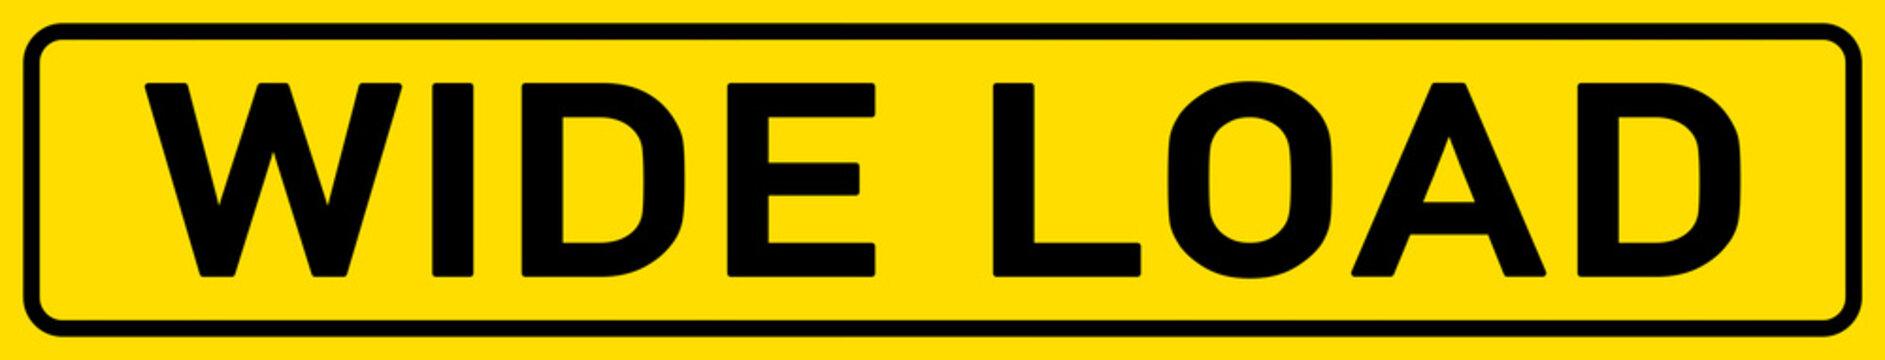 English Signs E300 - Wide Load